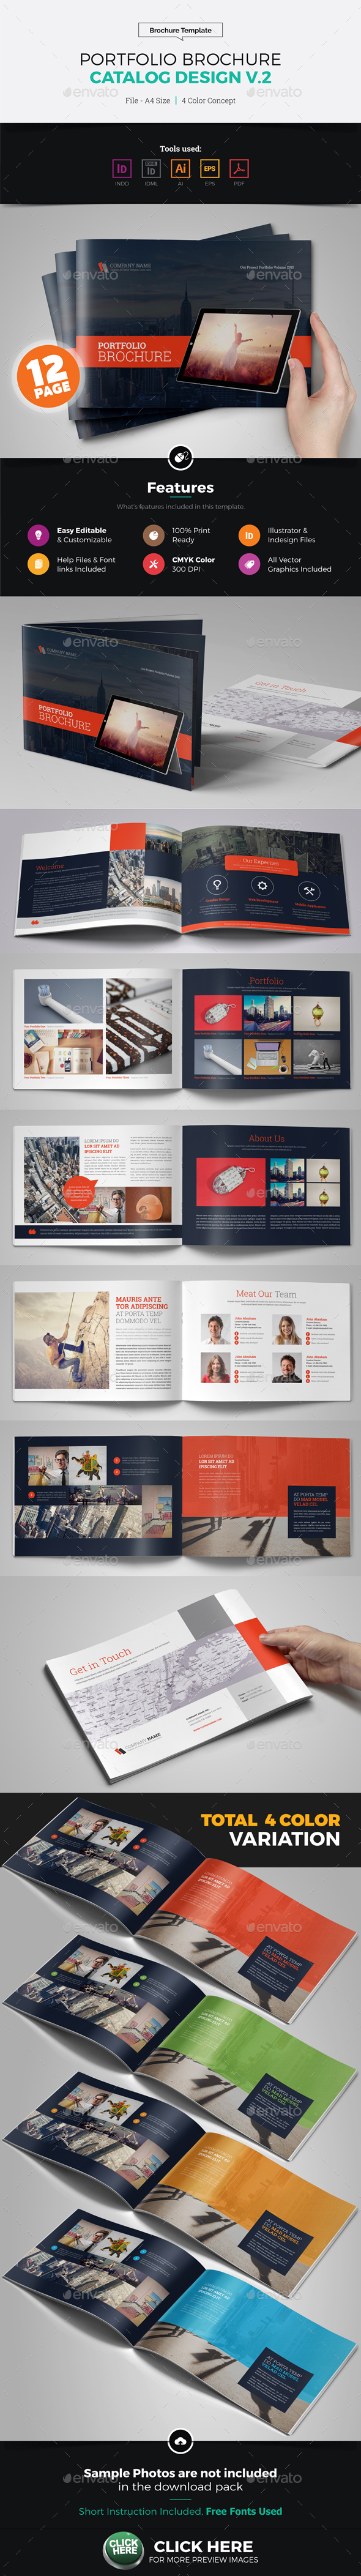 Portfolio Brochure Catalog Design v2 - Corporate Brochures